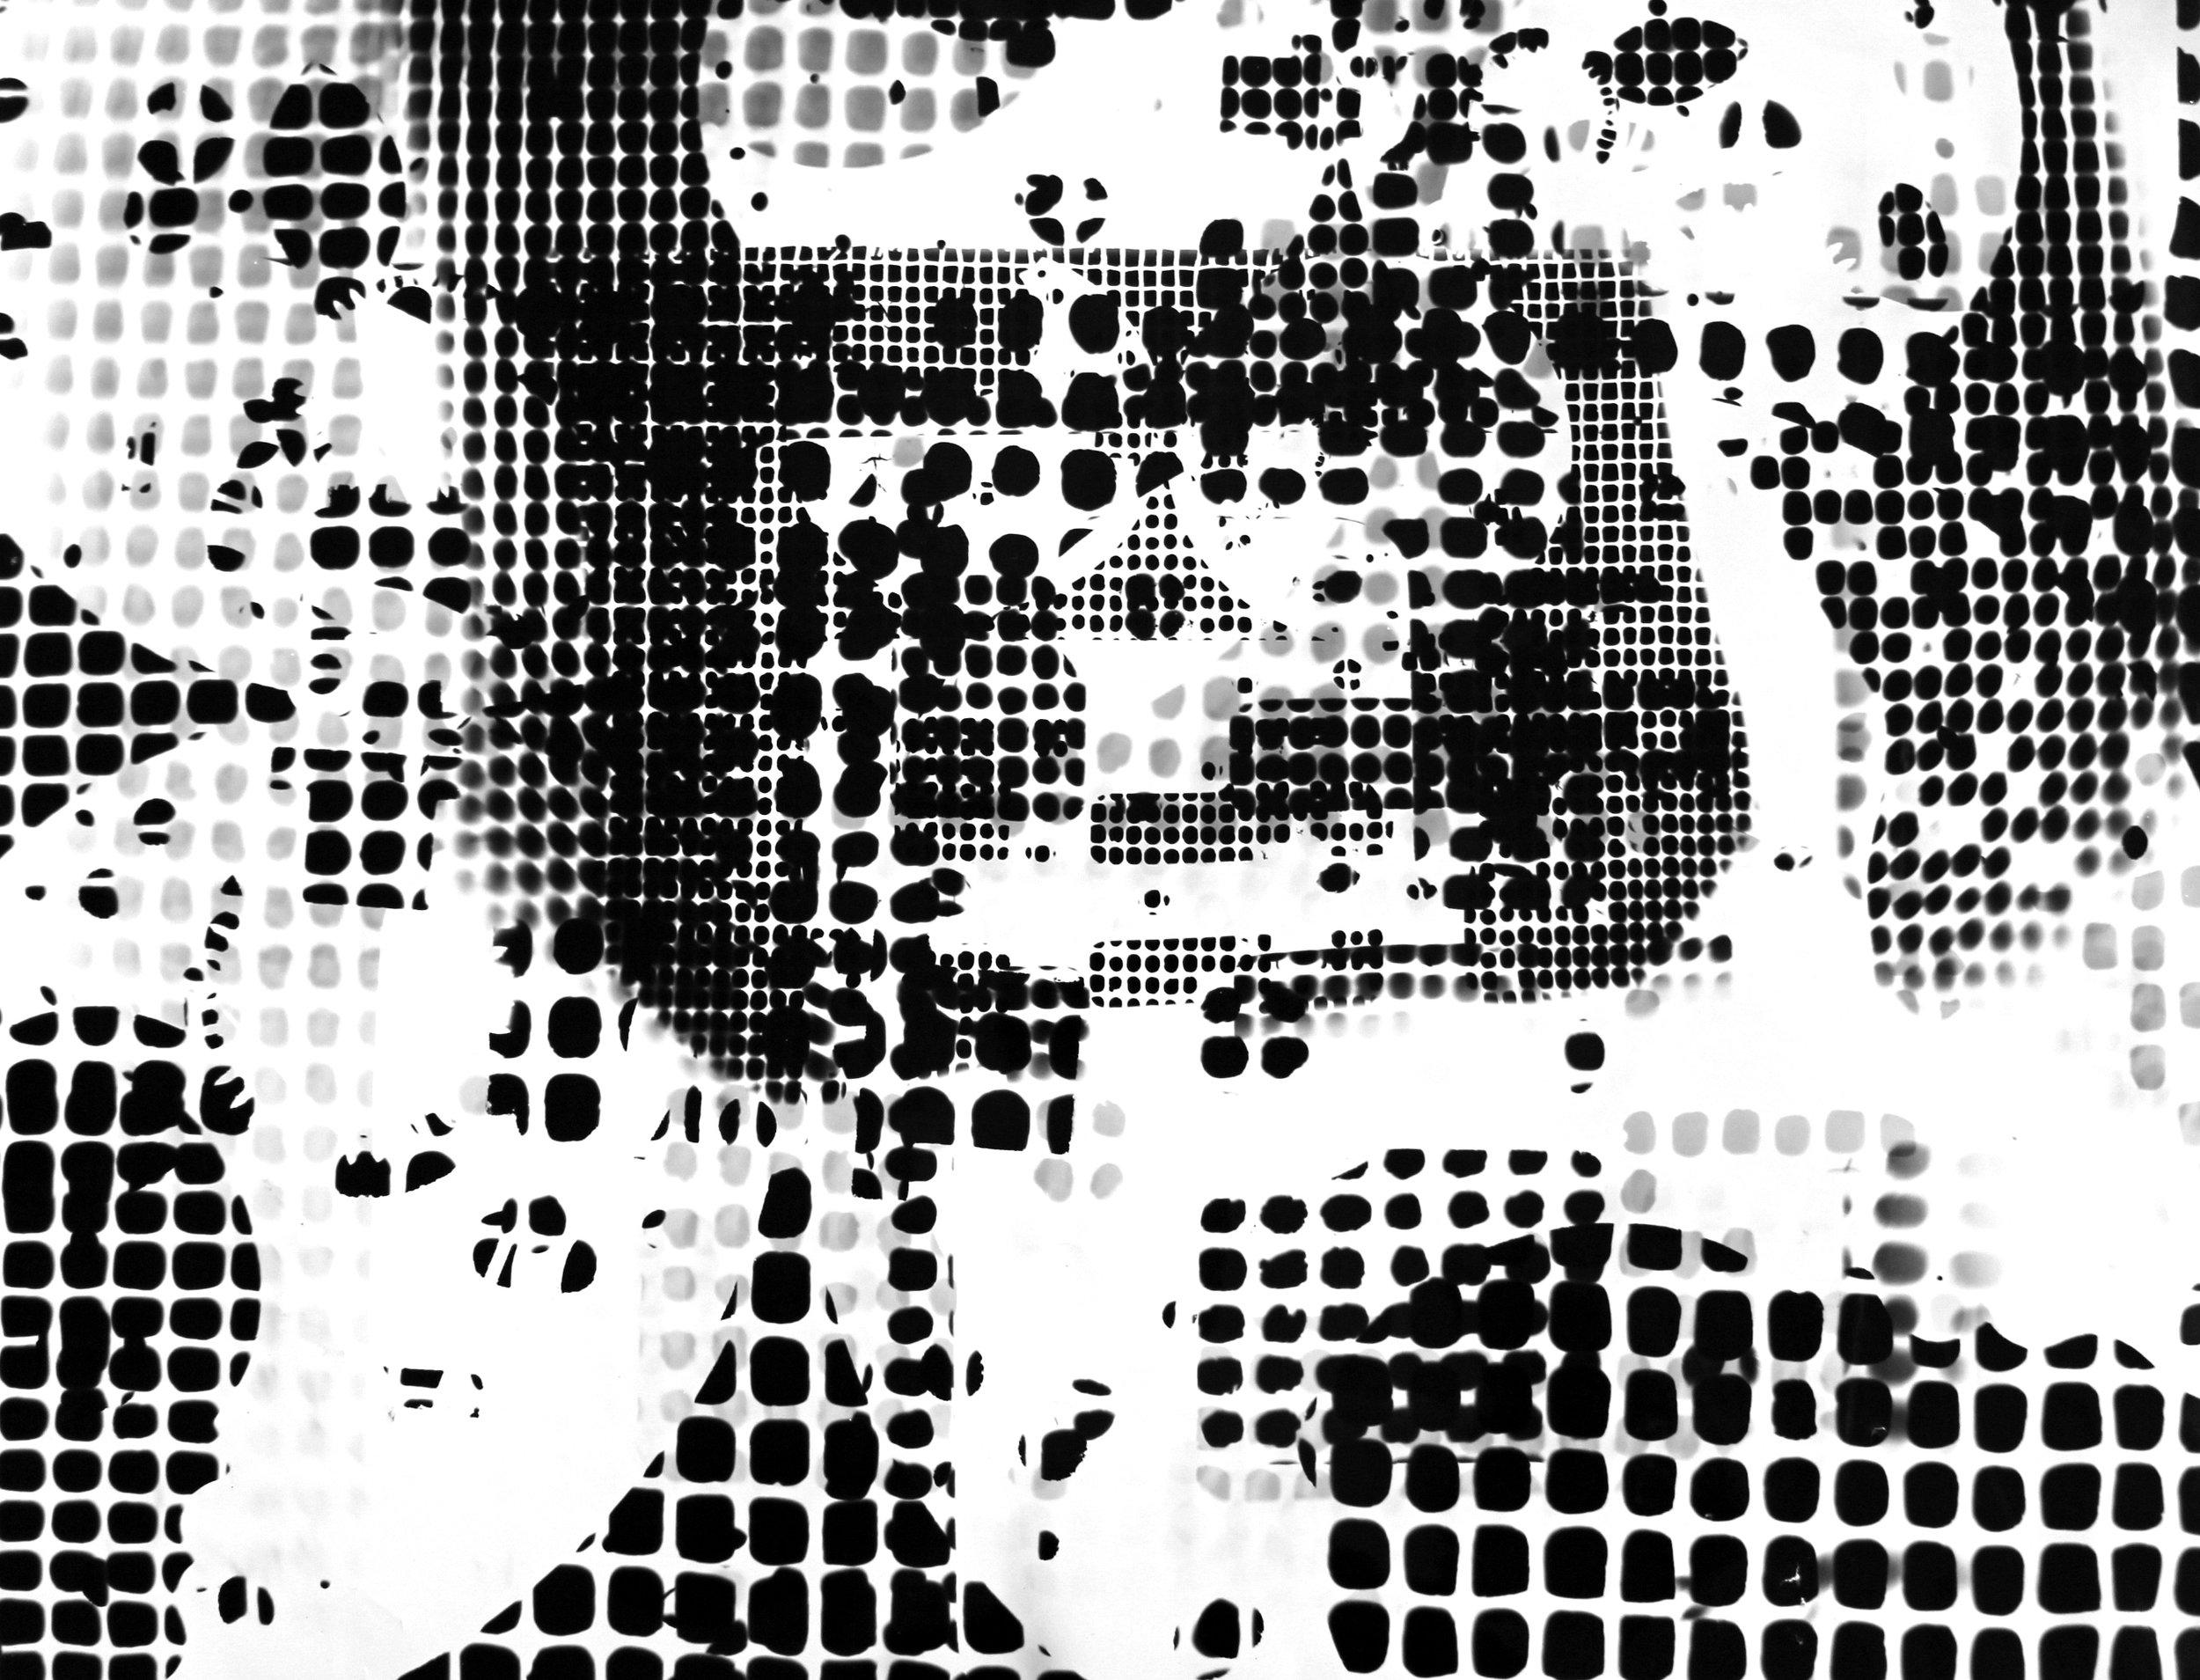 Roger Humbert_ Ohne Titel_1951_Silbergelatineabzug auf Baryt Papier (Agfa-Gevaert)_47 x 61 cm_Unikat.JPG